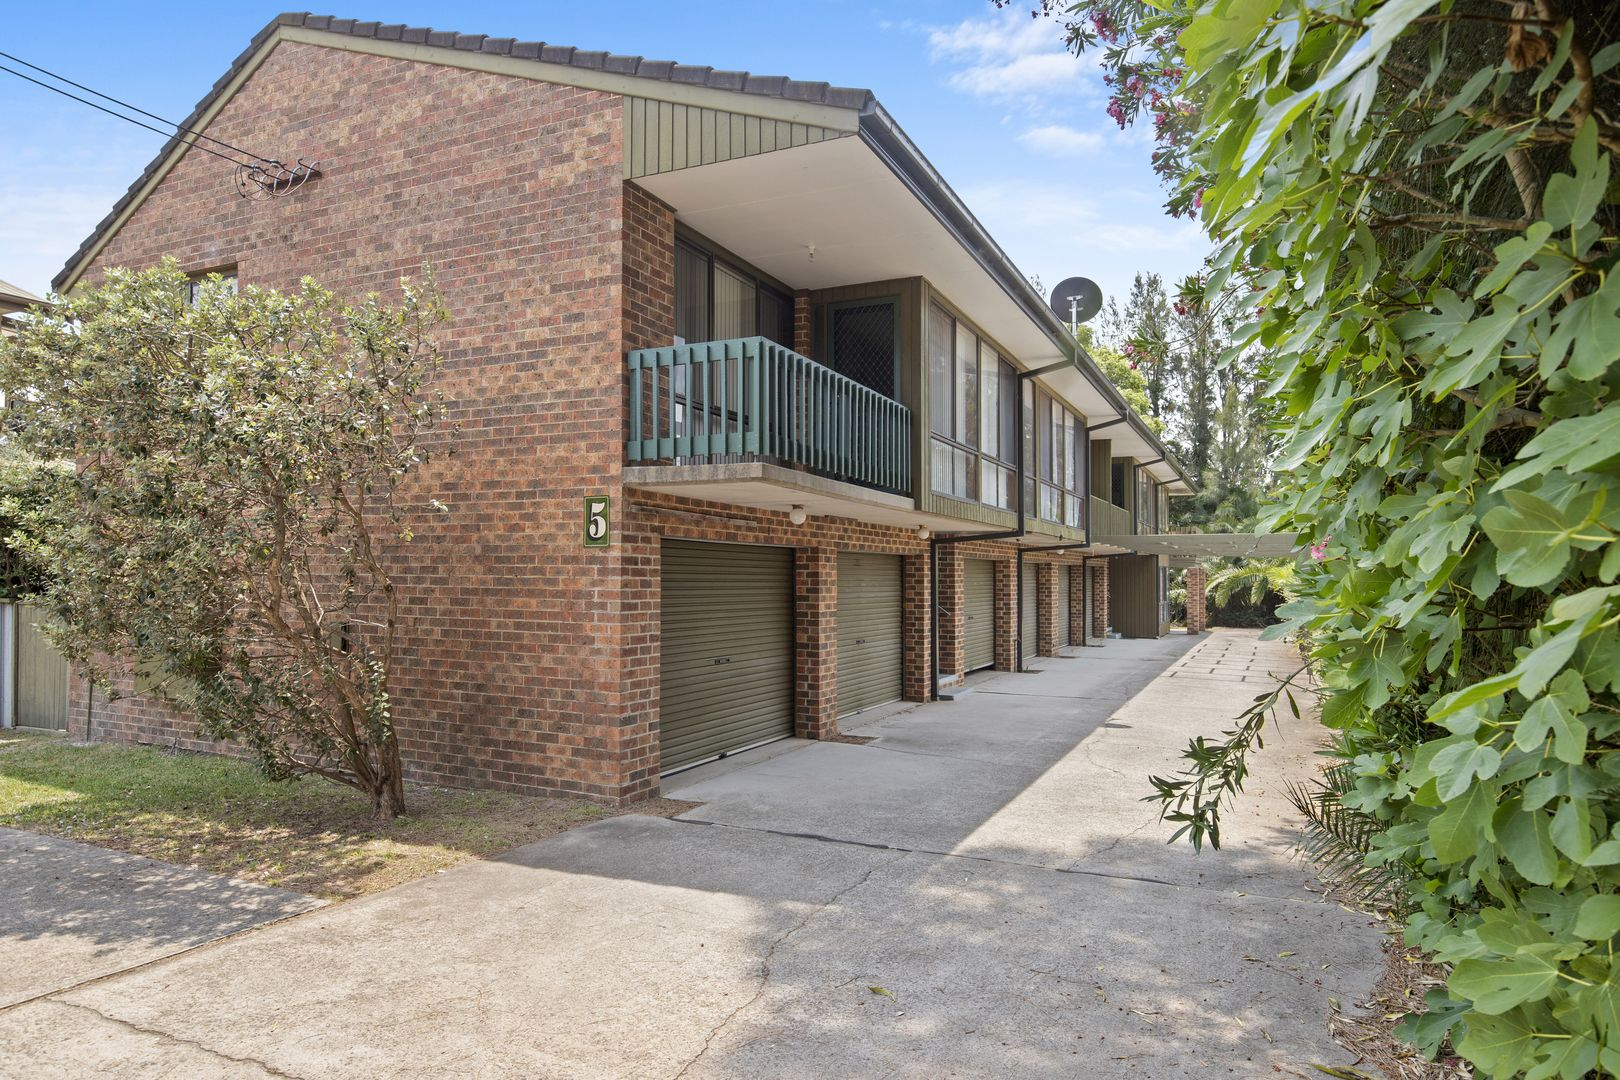 2/5 Avalon Street, Batemans Bay NSW 2536, Image 0